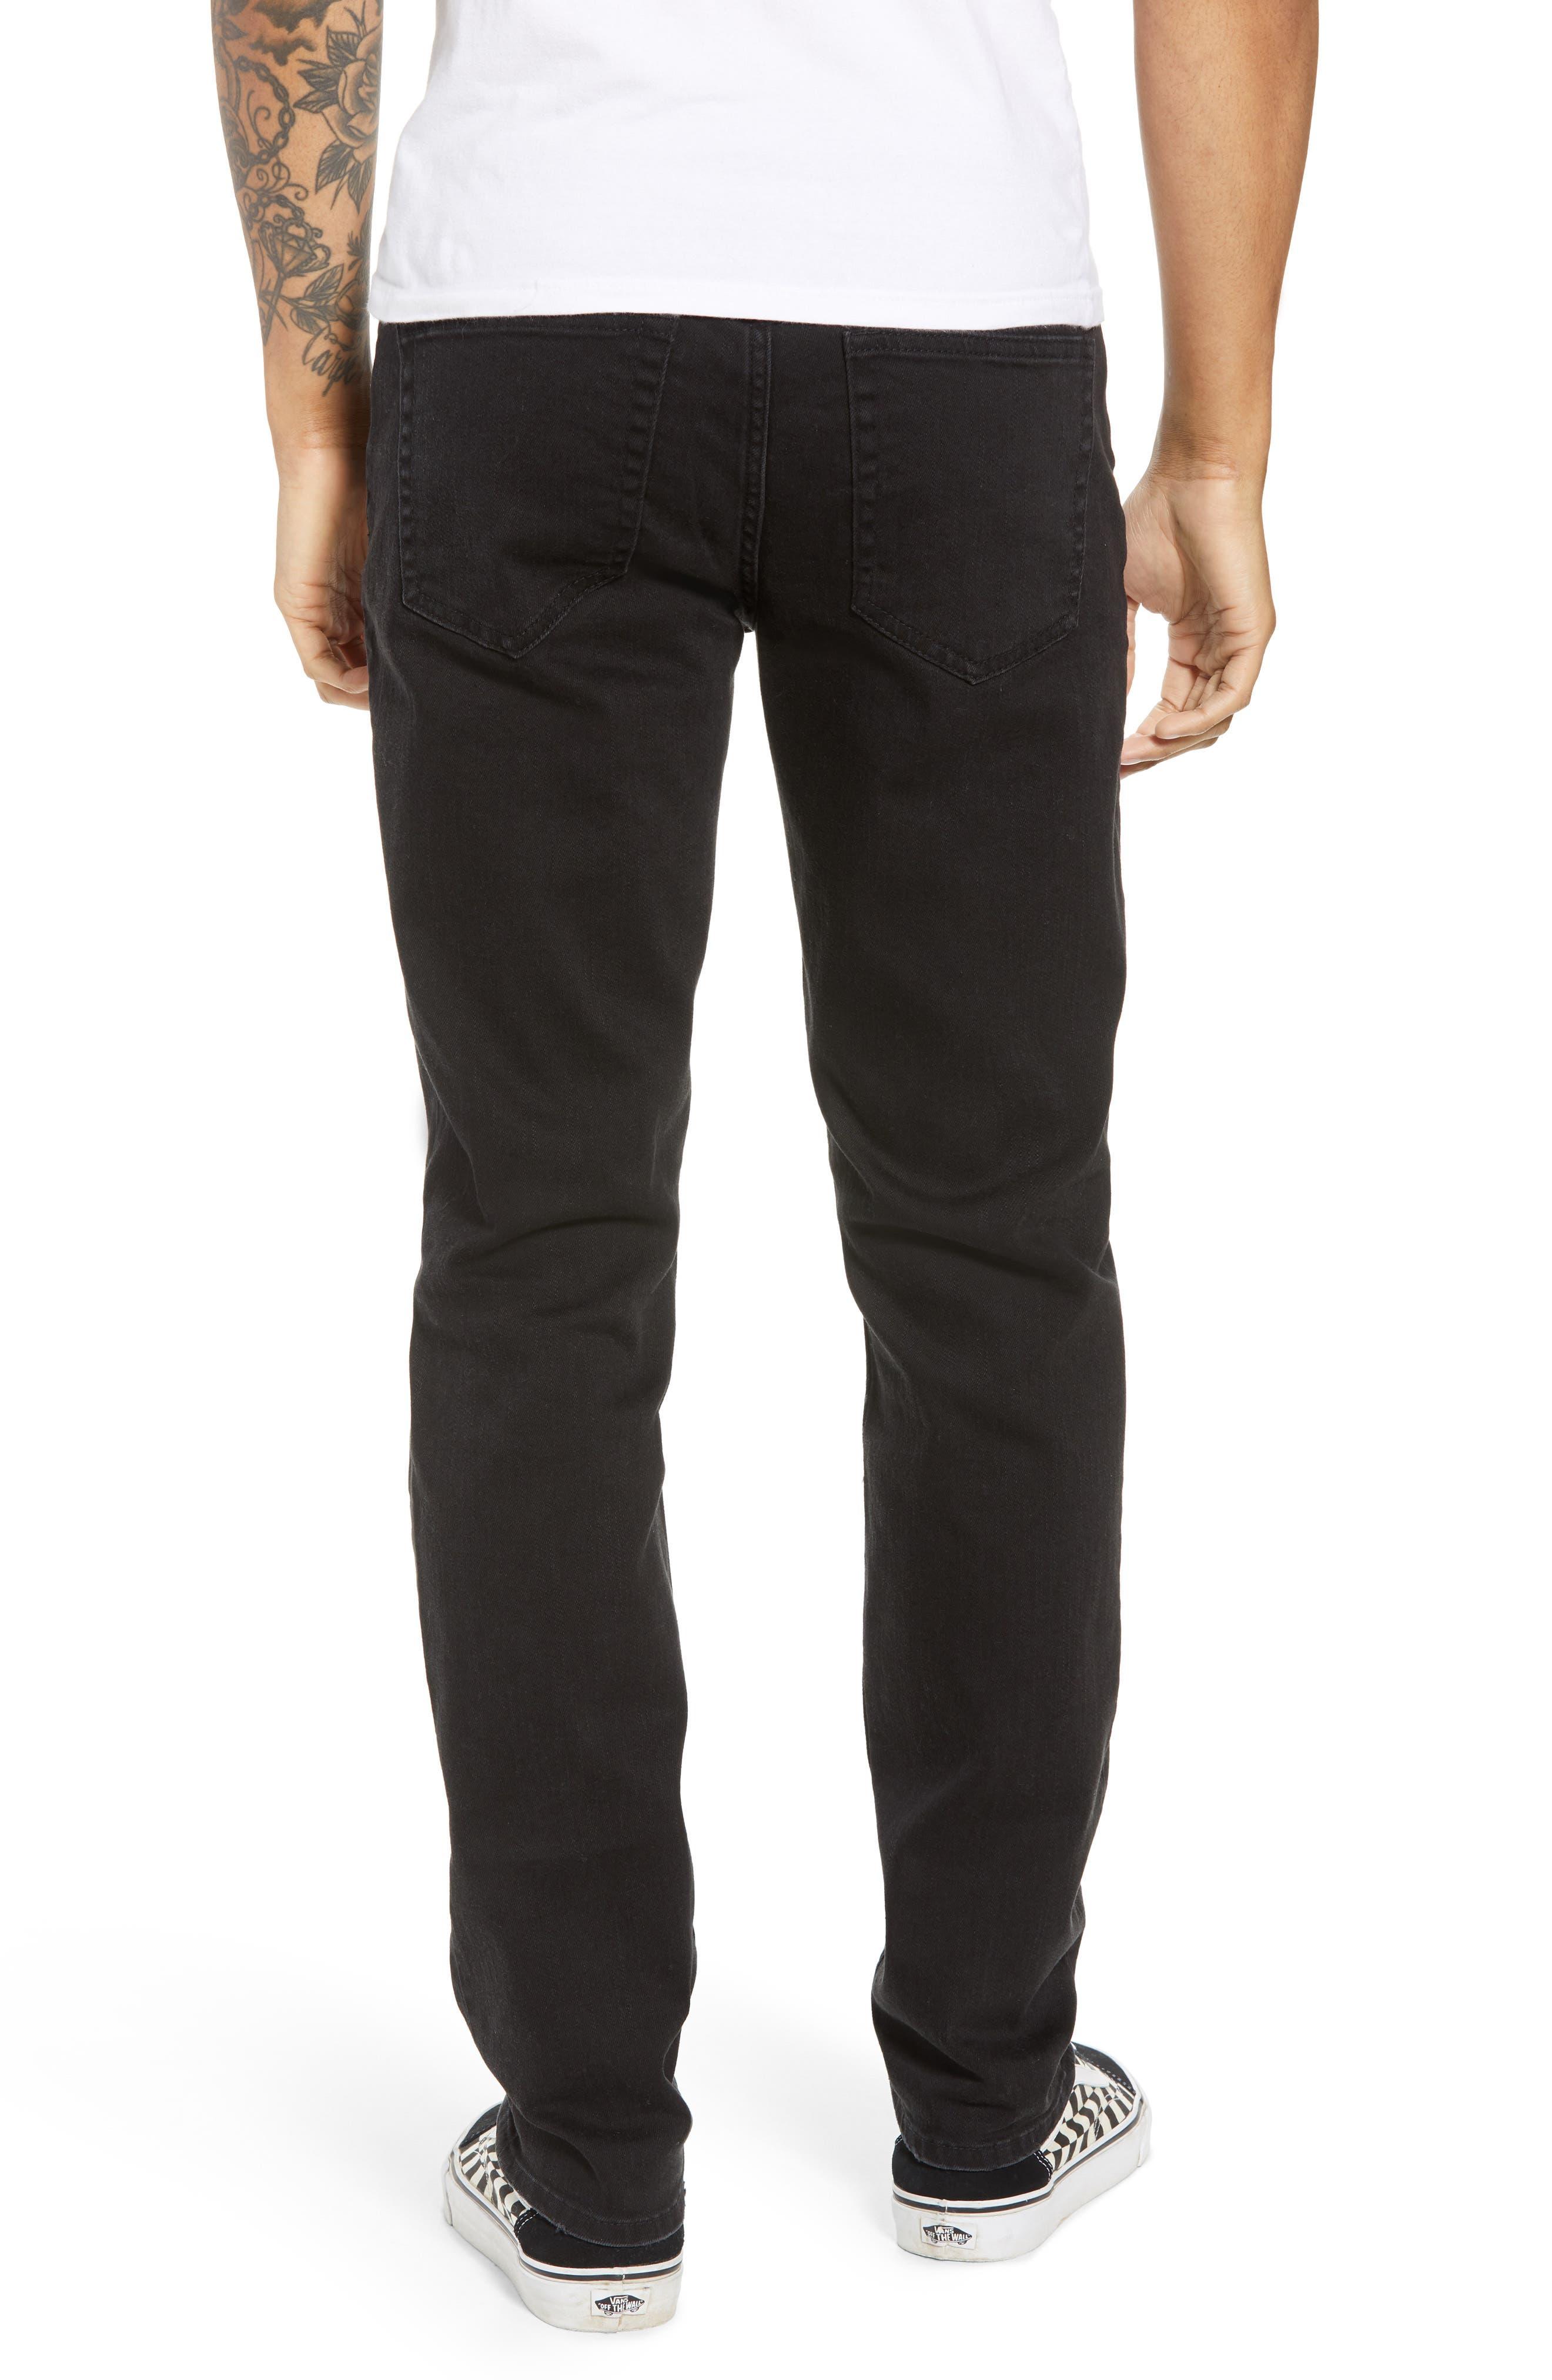 Ripped Skinny Jeans,                             Alternate thumbnail 2, color,                             BLACK STONE WASH